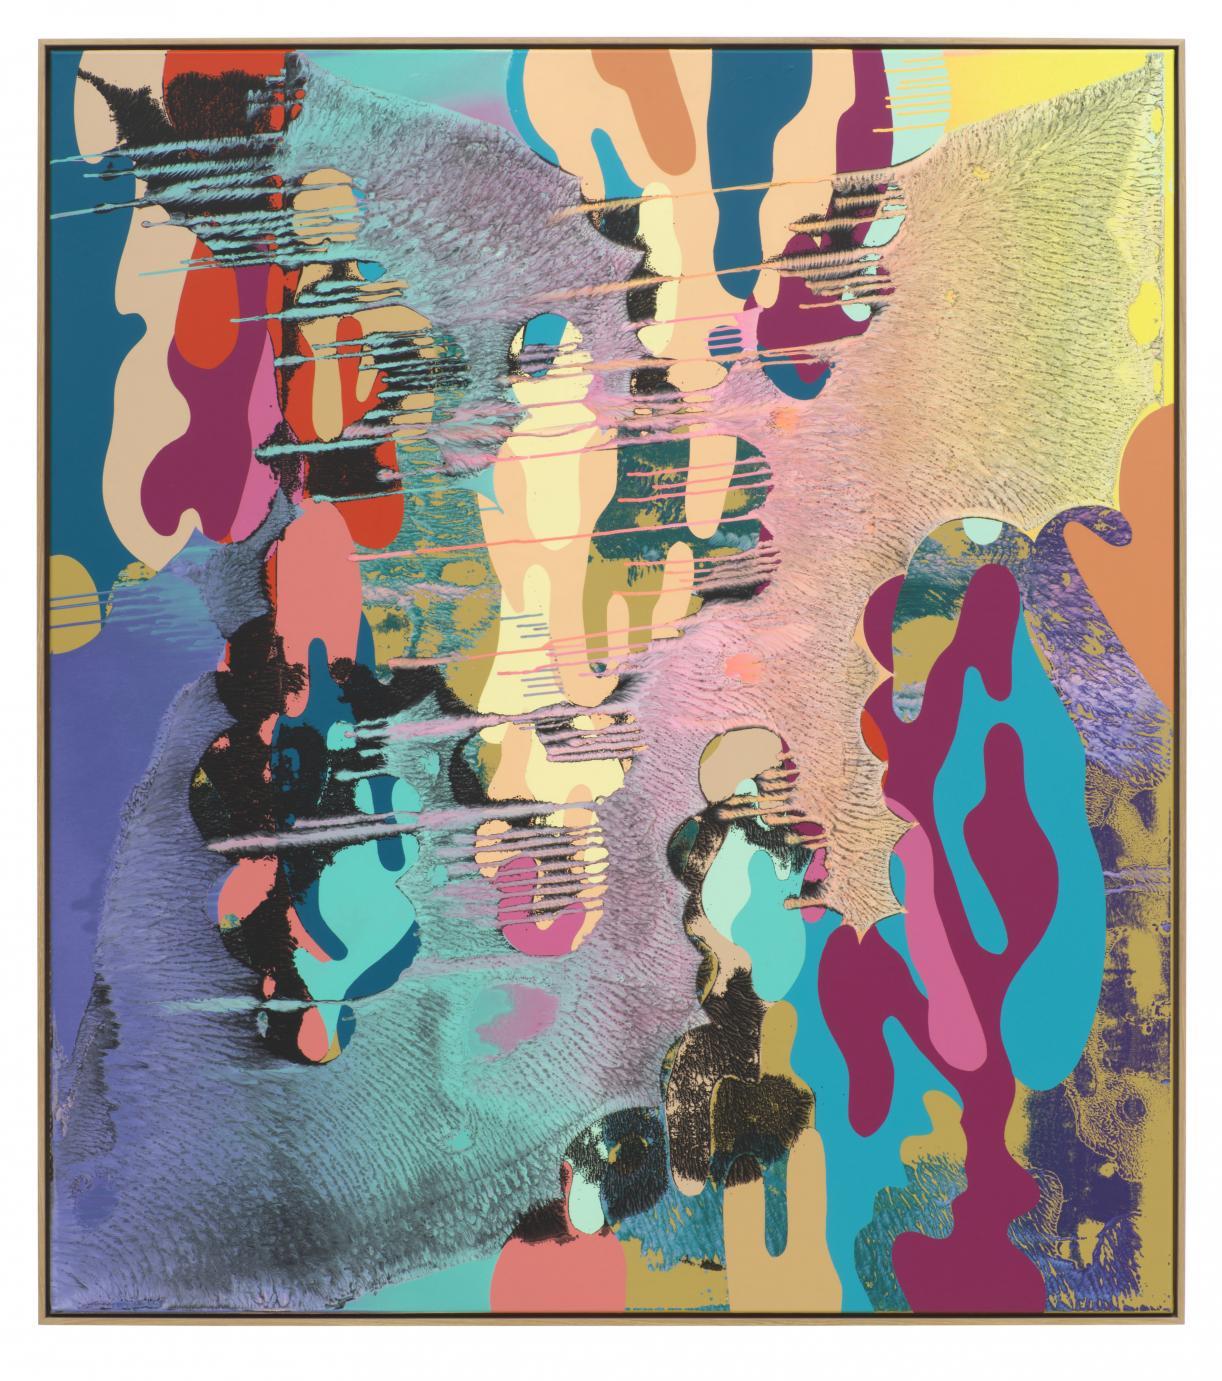 Christine Streuli, Rebel_Caroline, 2018, Mixed media on canvas, 183,5 x 163 cm